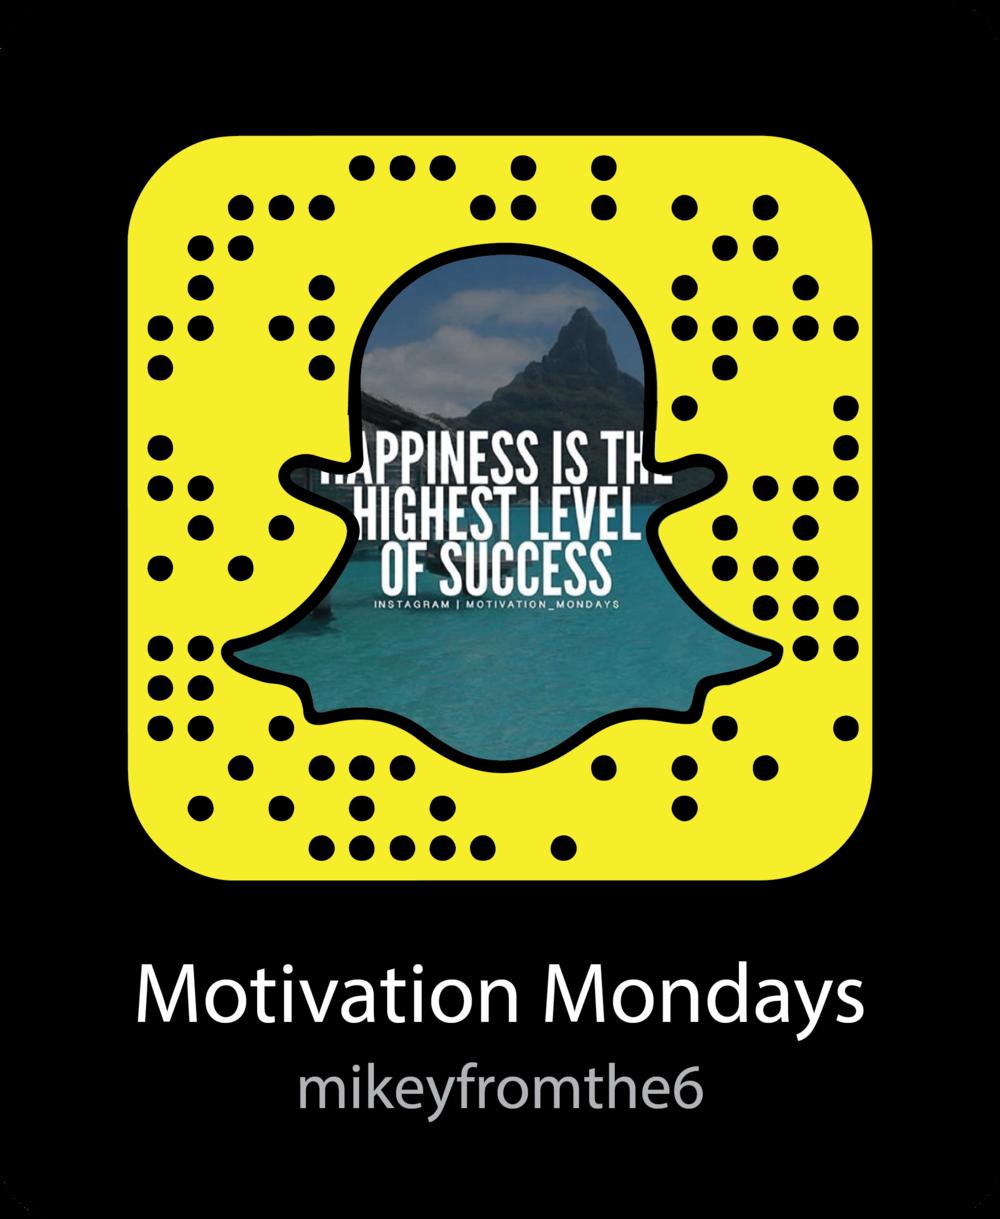 motivation-mondays-storytellers-snapchat-snapcode.png